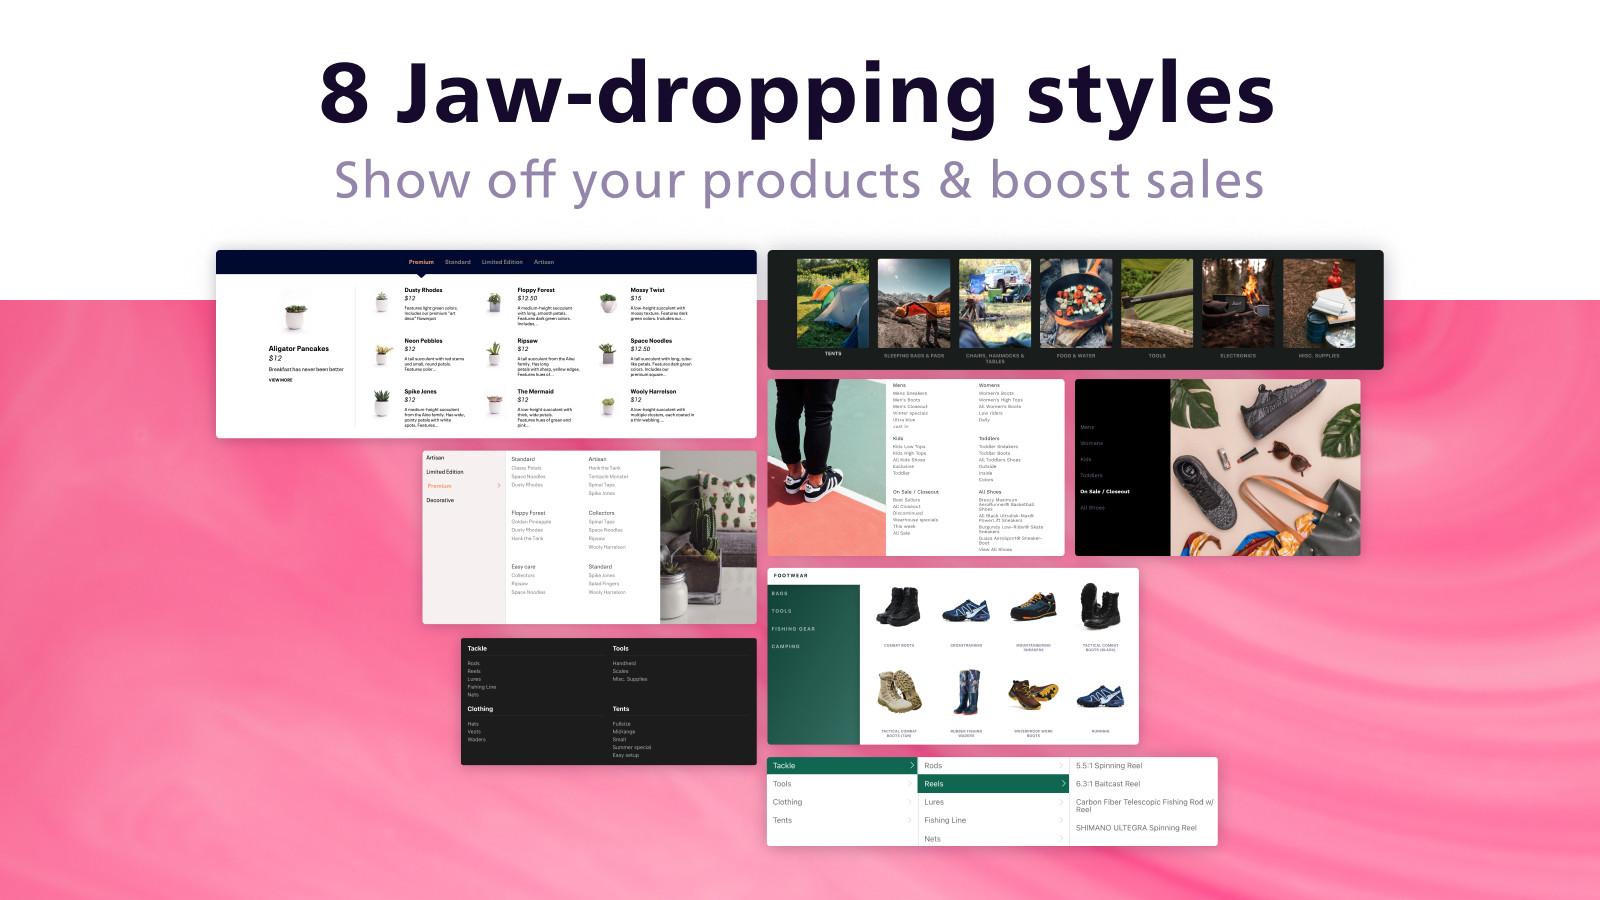 8 jaw-dropping mega menu styles with dropdown navigation